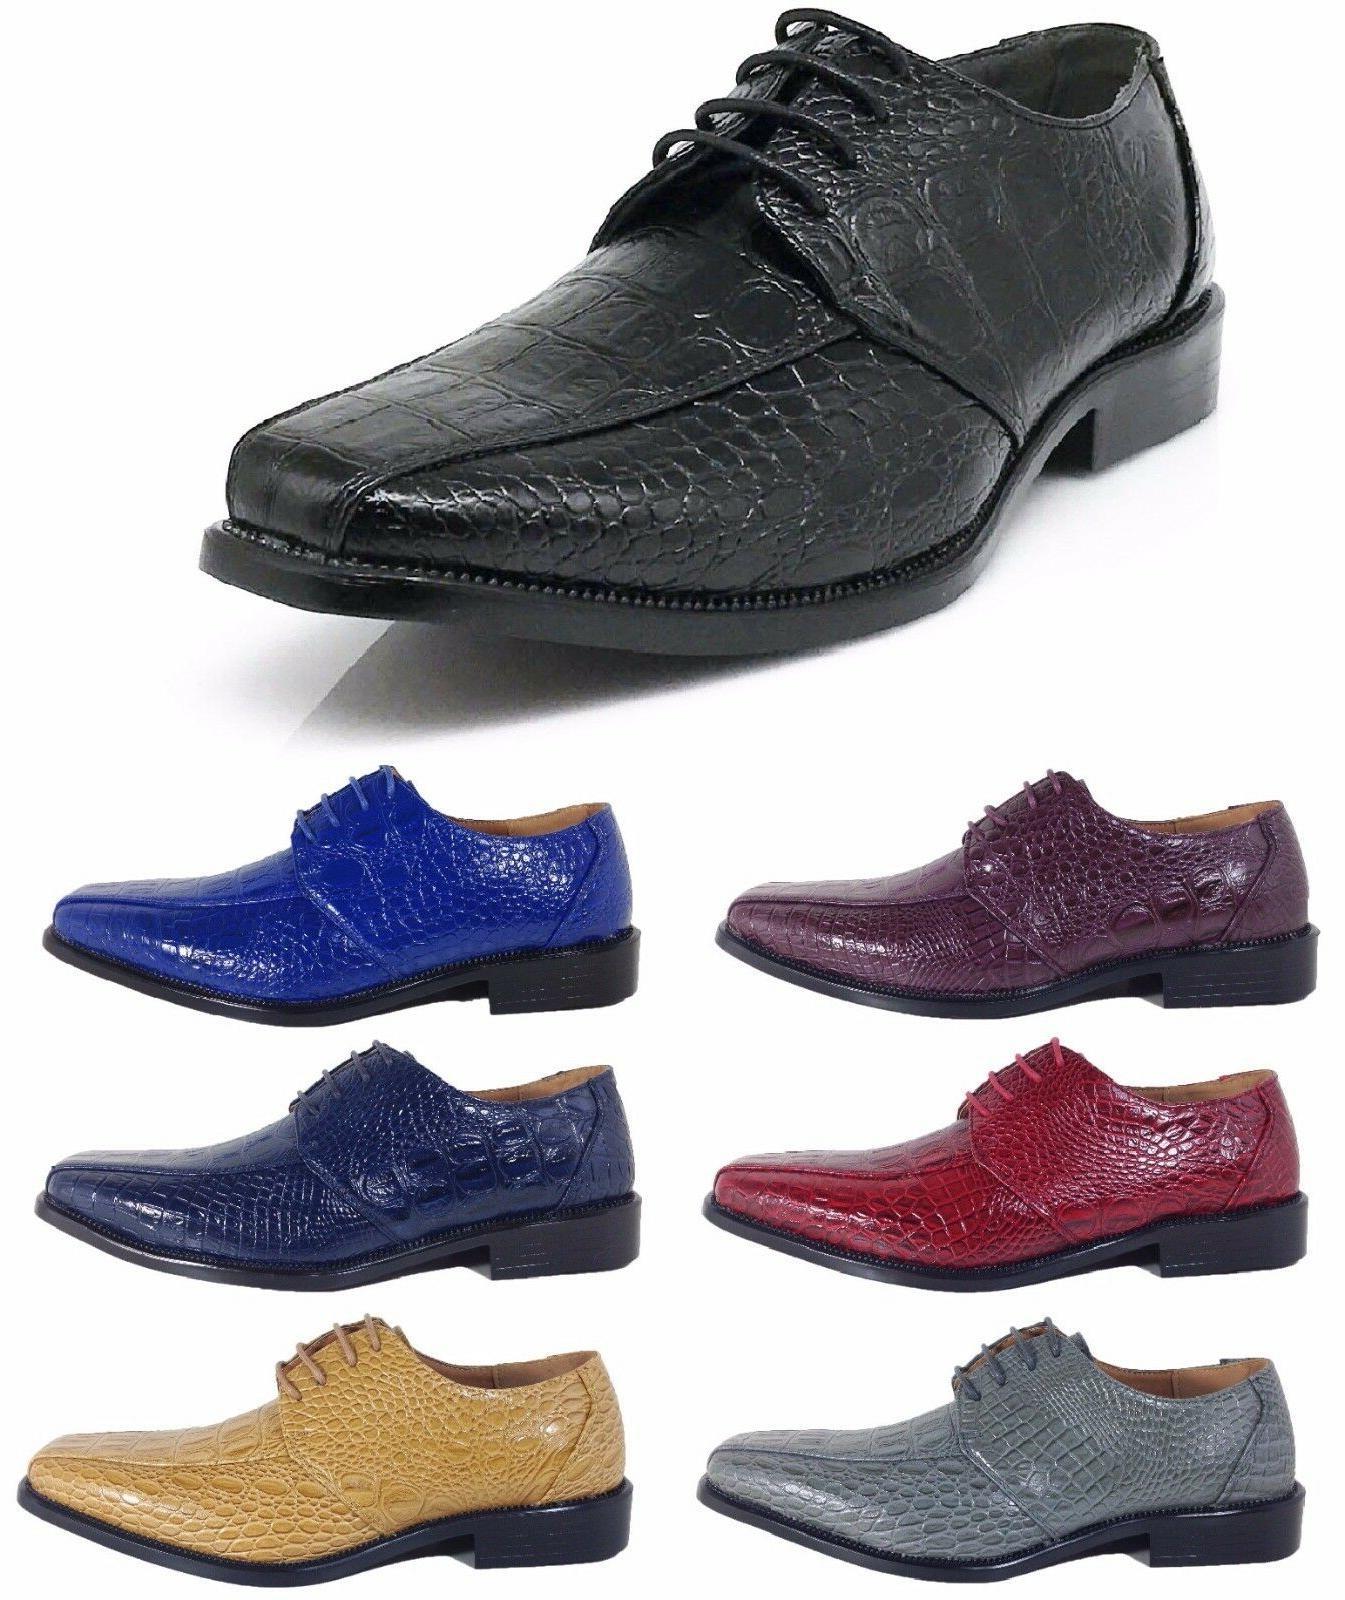 parrazo men dress shoes crocodile printing oxford